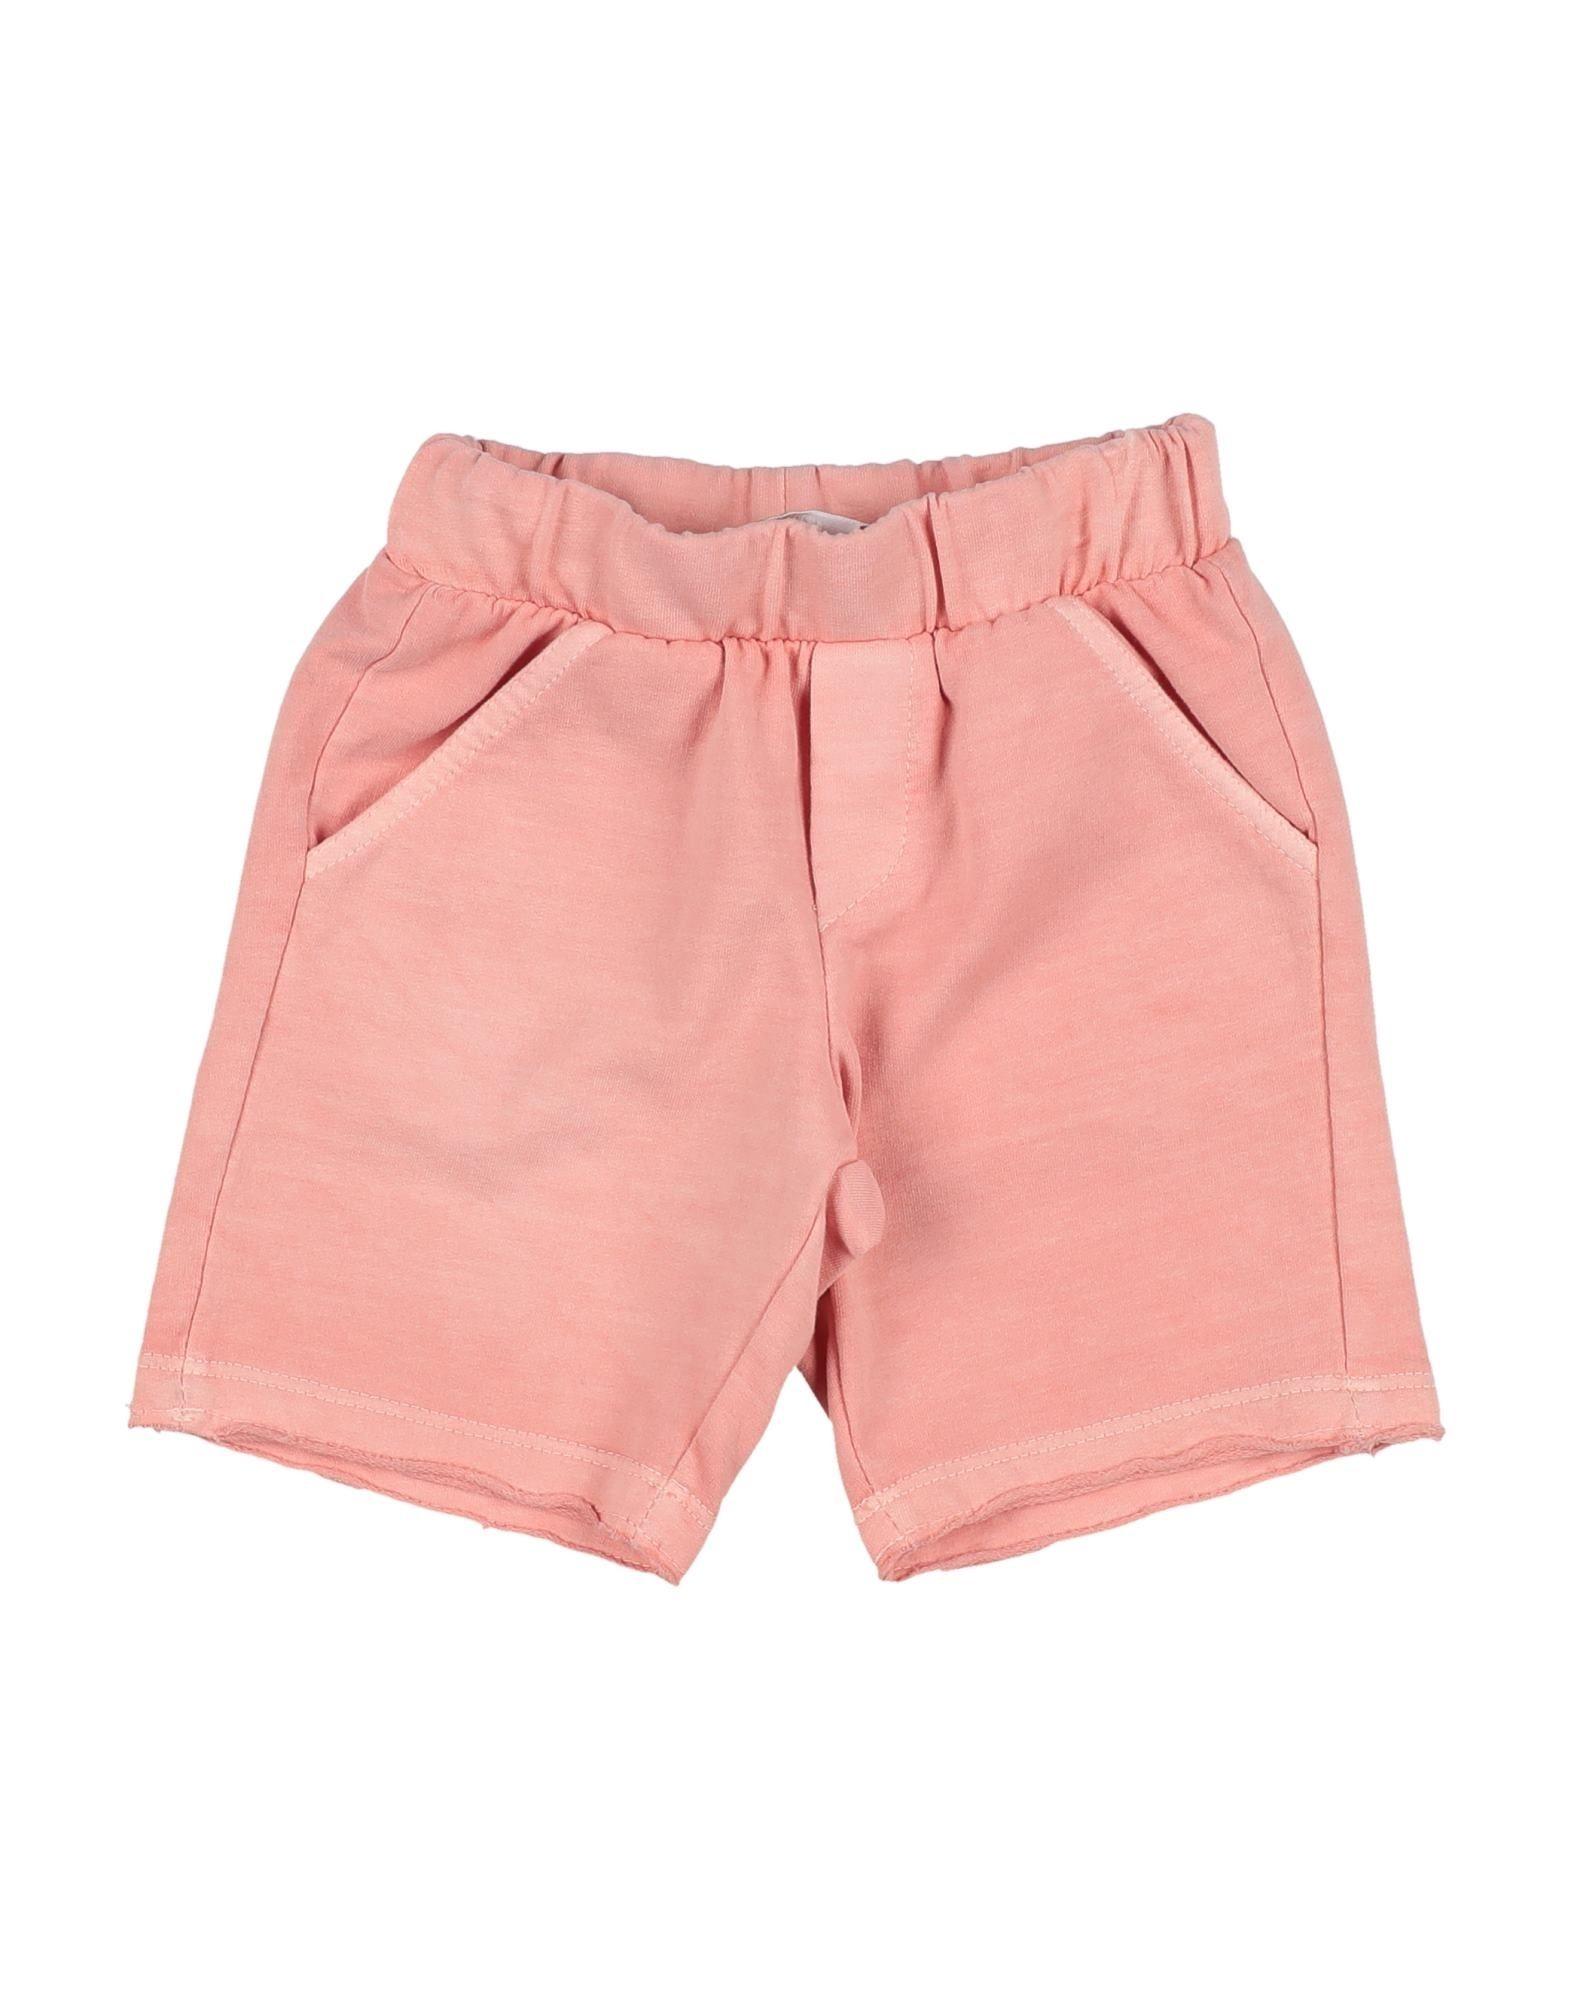 Muffin & Co. Kids' Bermudas In Pink